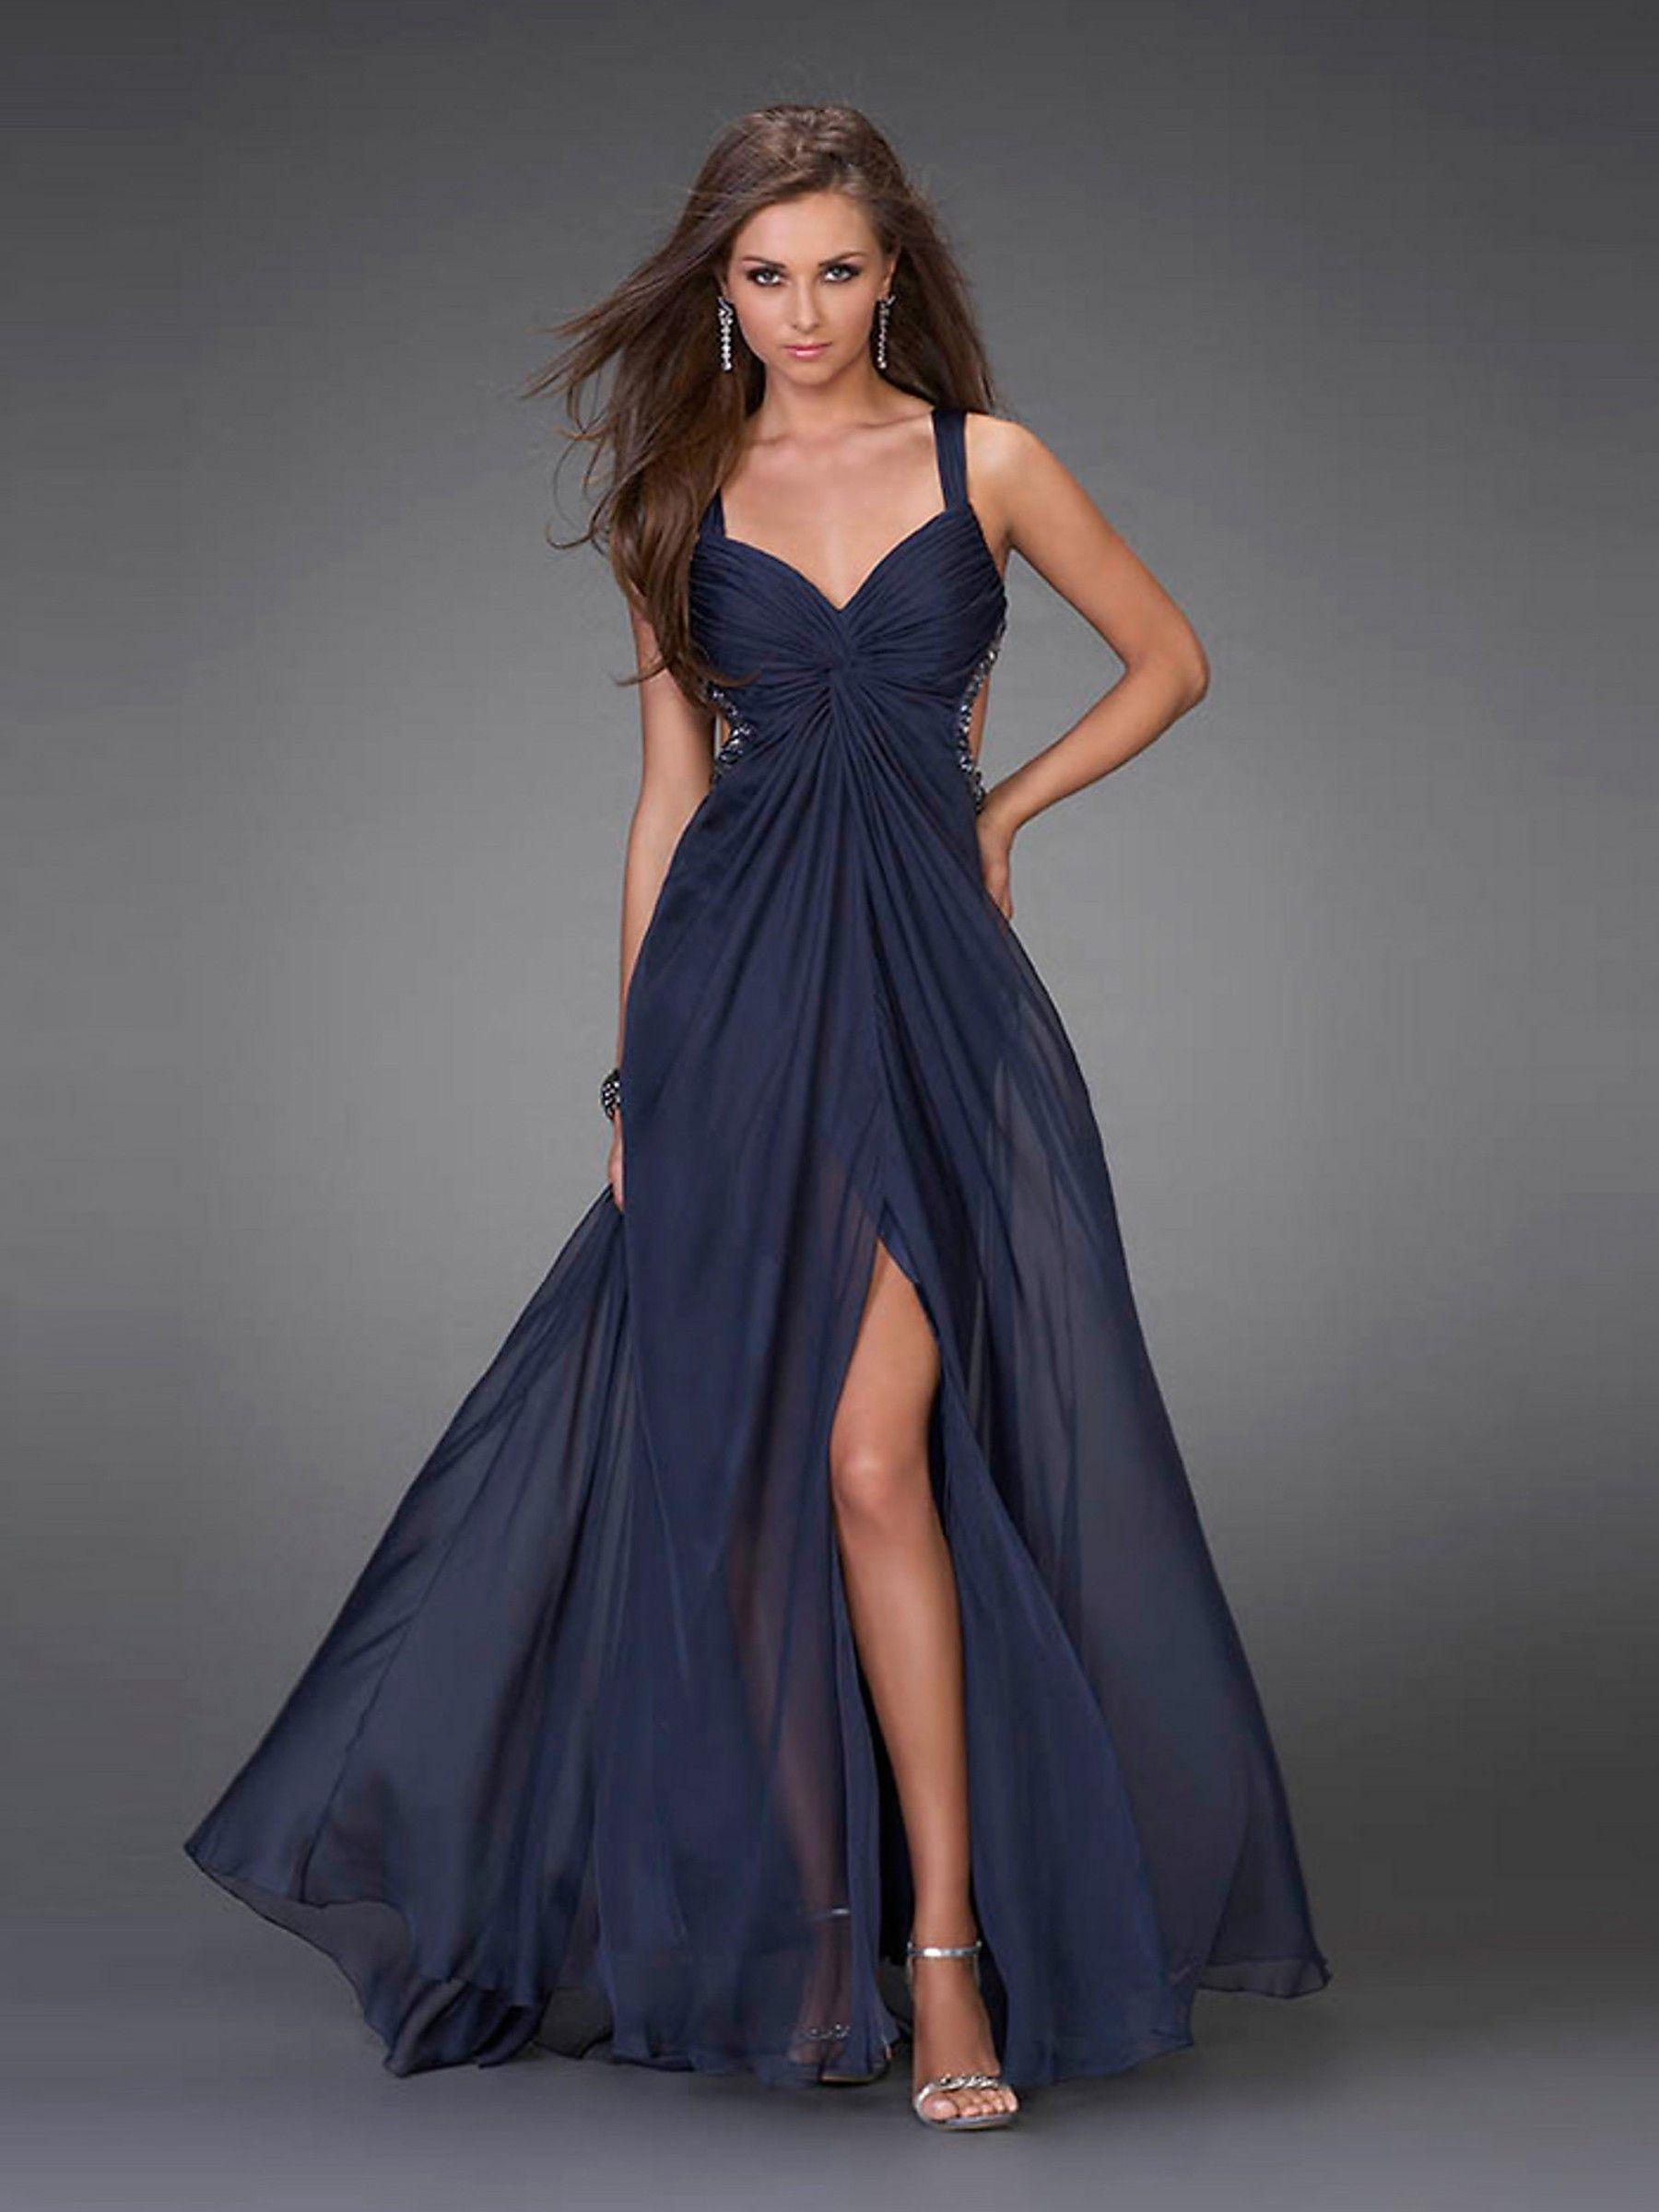 Glamorous Halter Neckline Prom Dress of Side Cut-Outs   Fancy ...